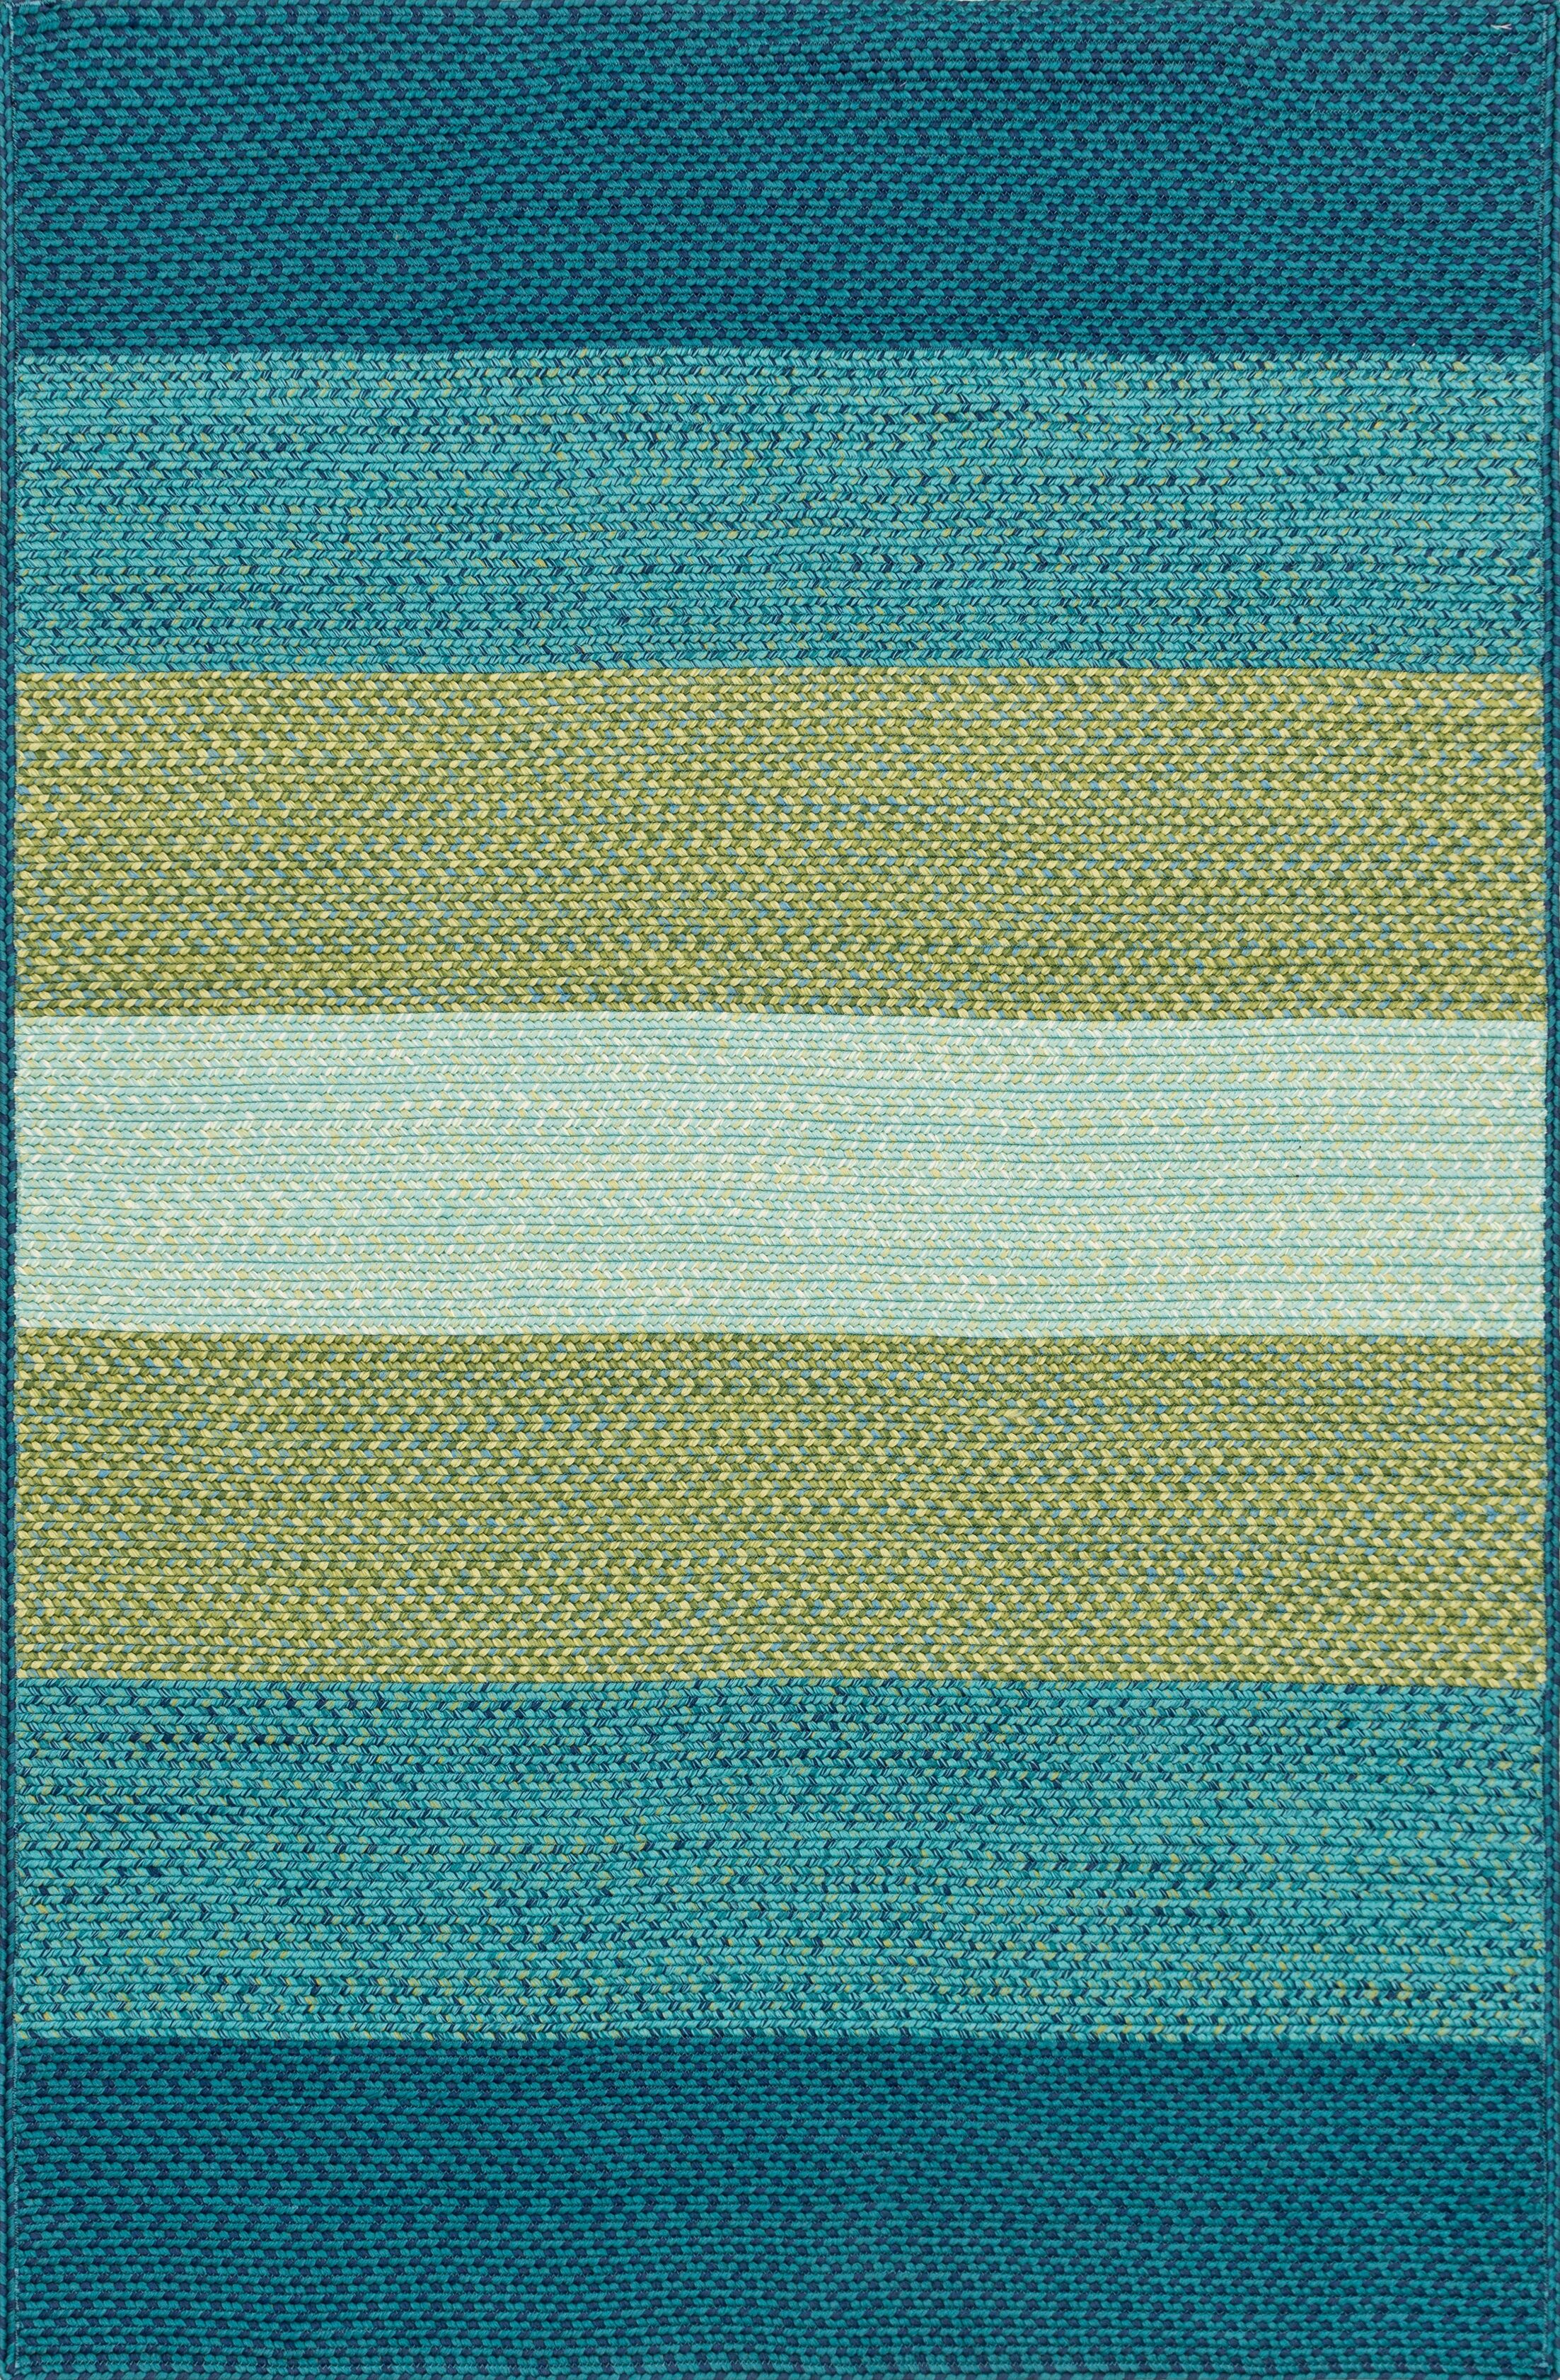 Barta Hand-Braided Blue/Green Indoor/Outdoor Area Rug Rug Size: Rectangle 5' x 7'6